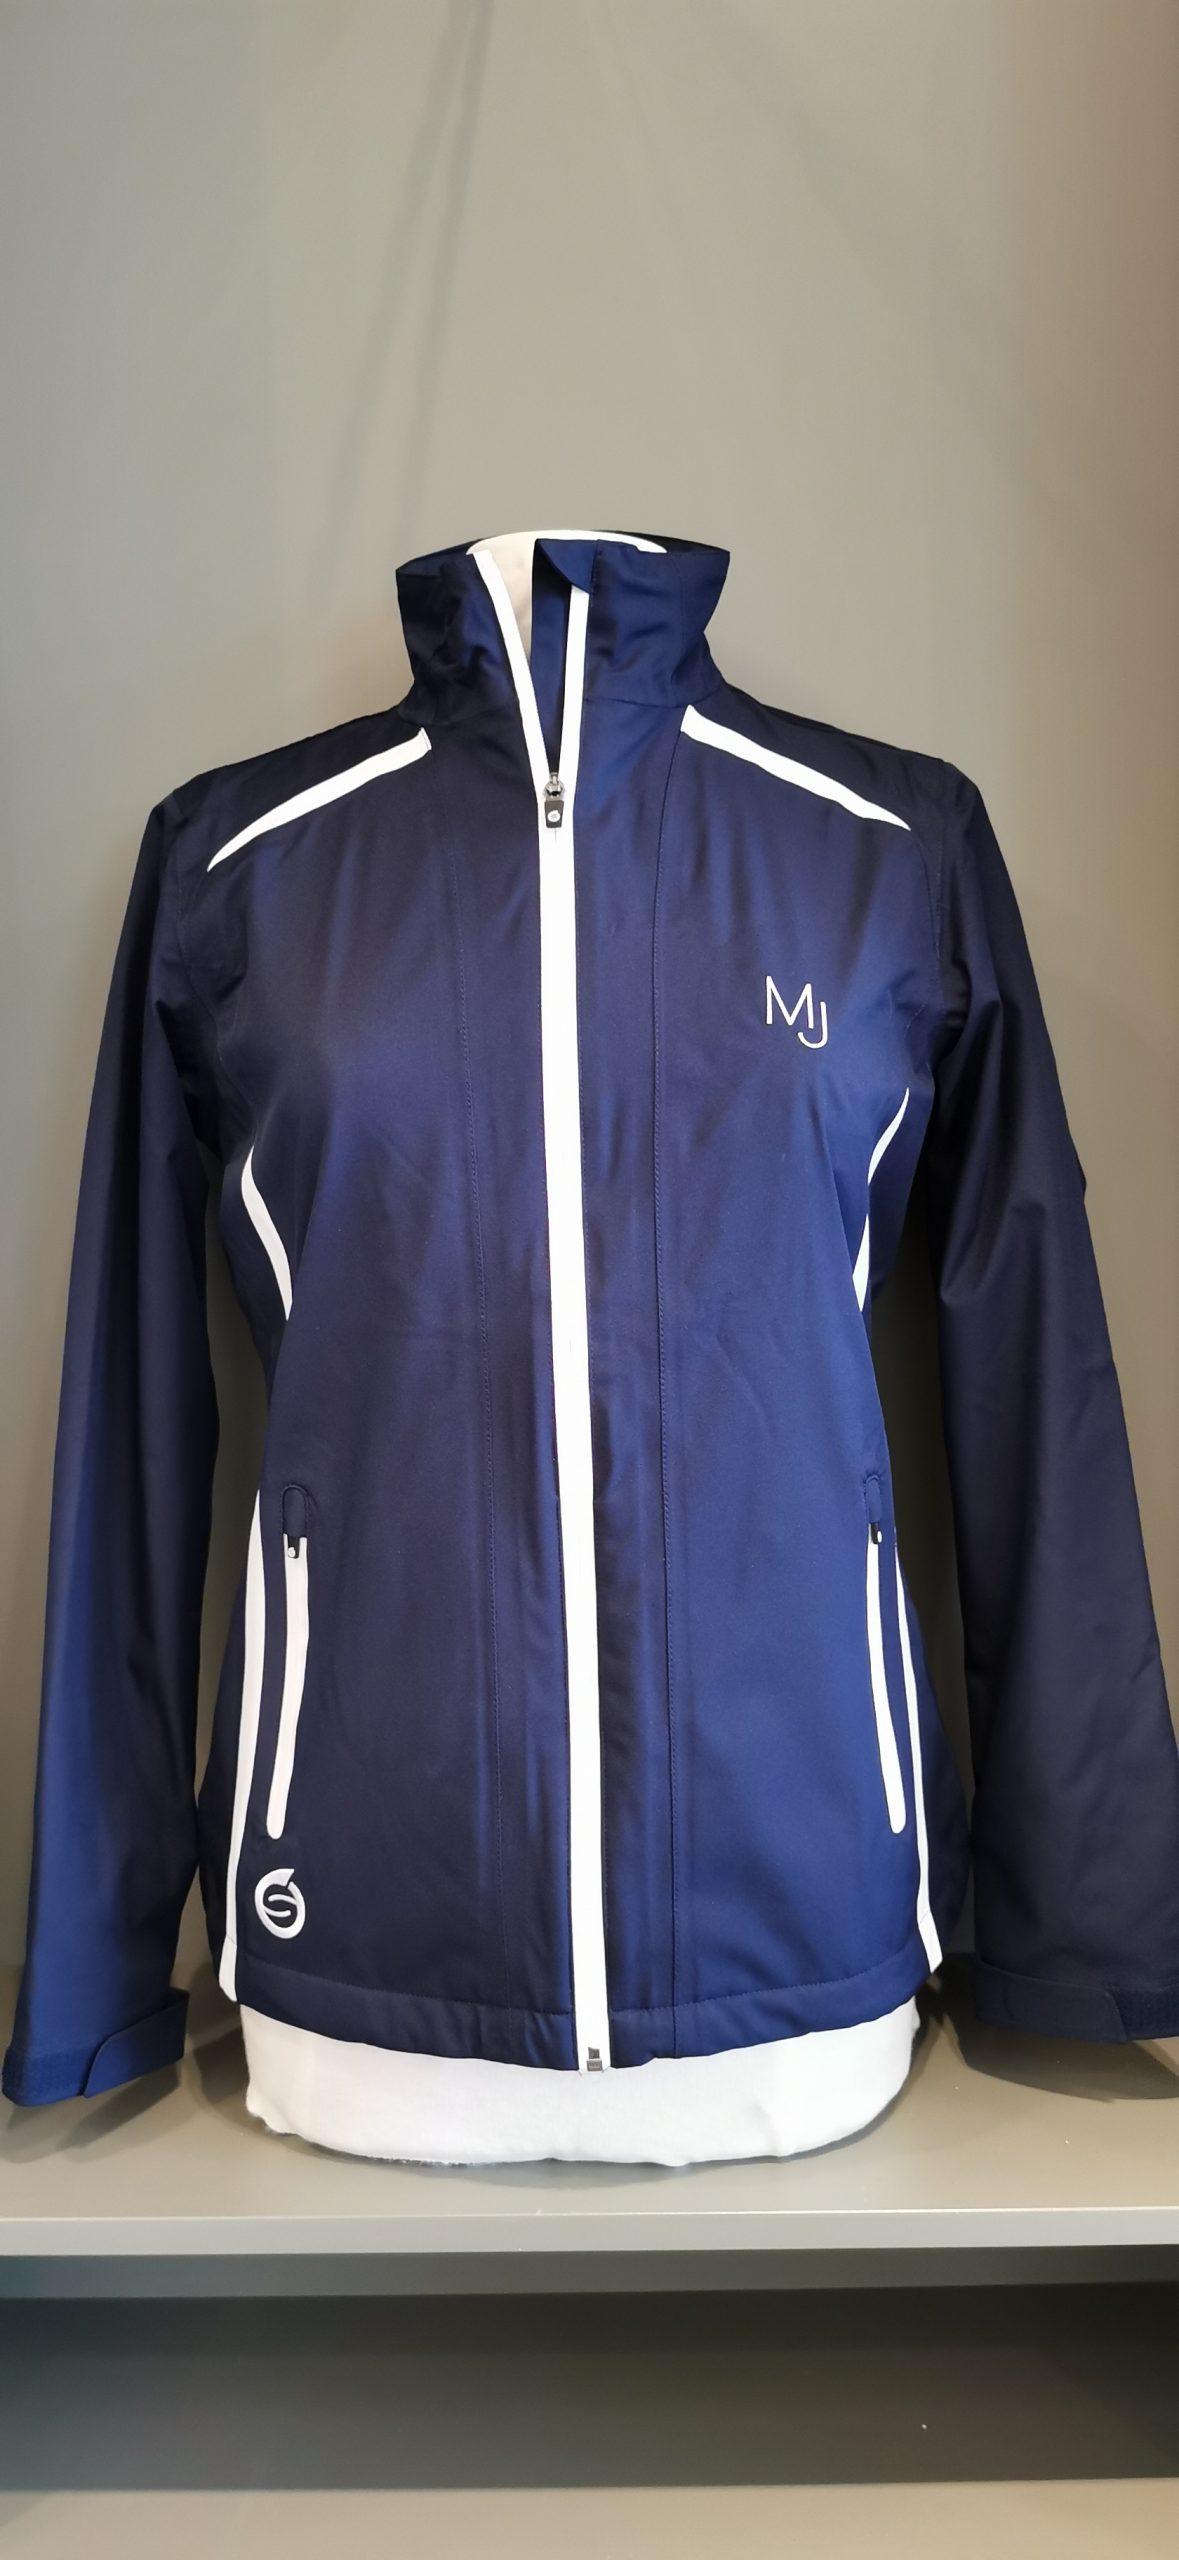 Sunderland Waterproof Jackets